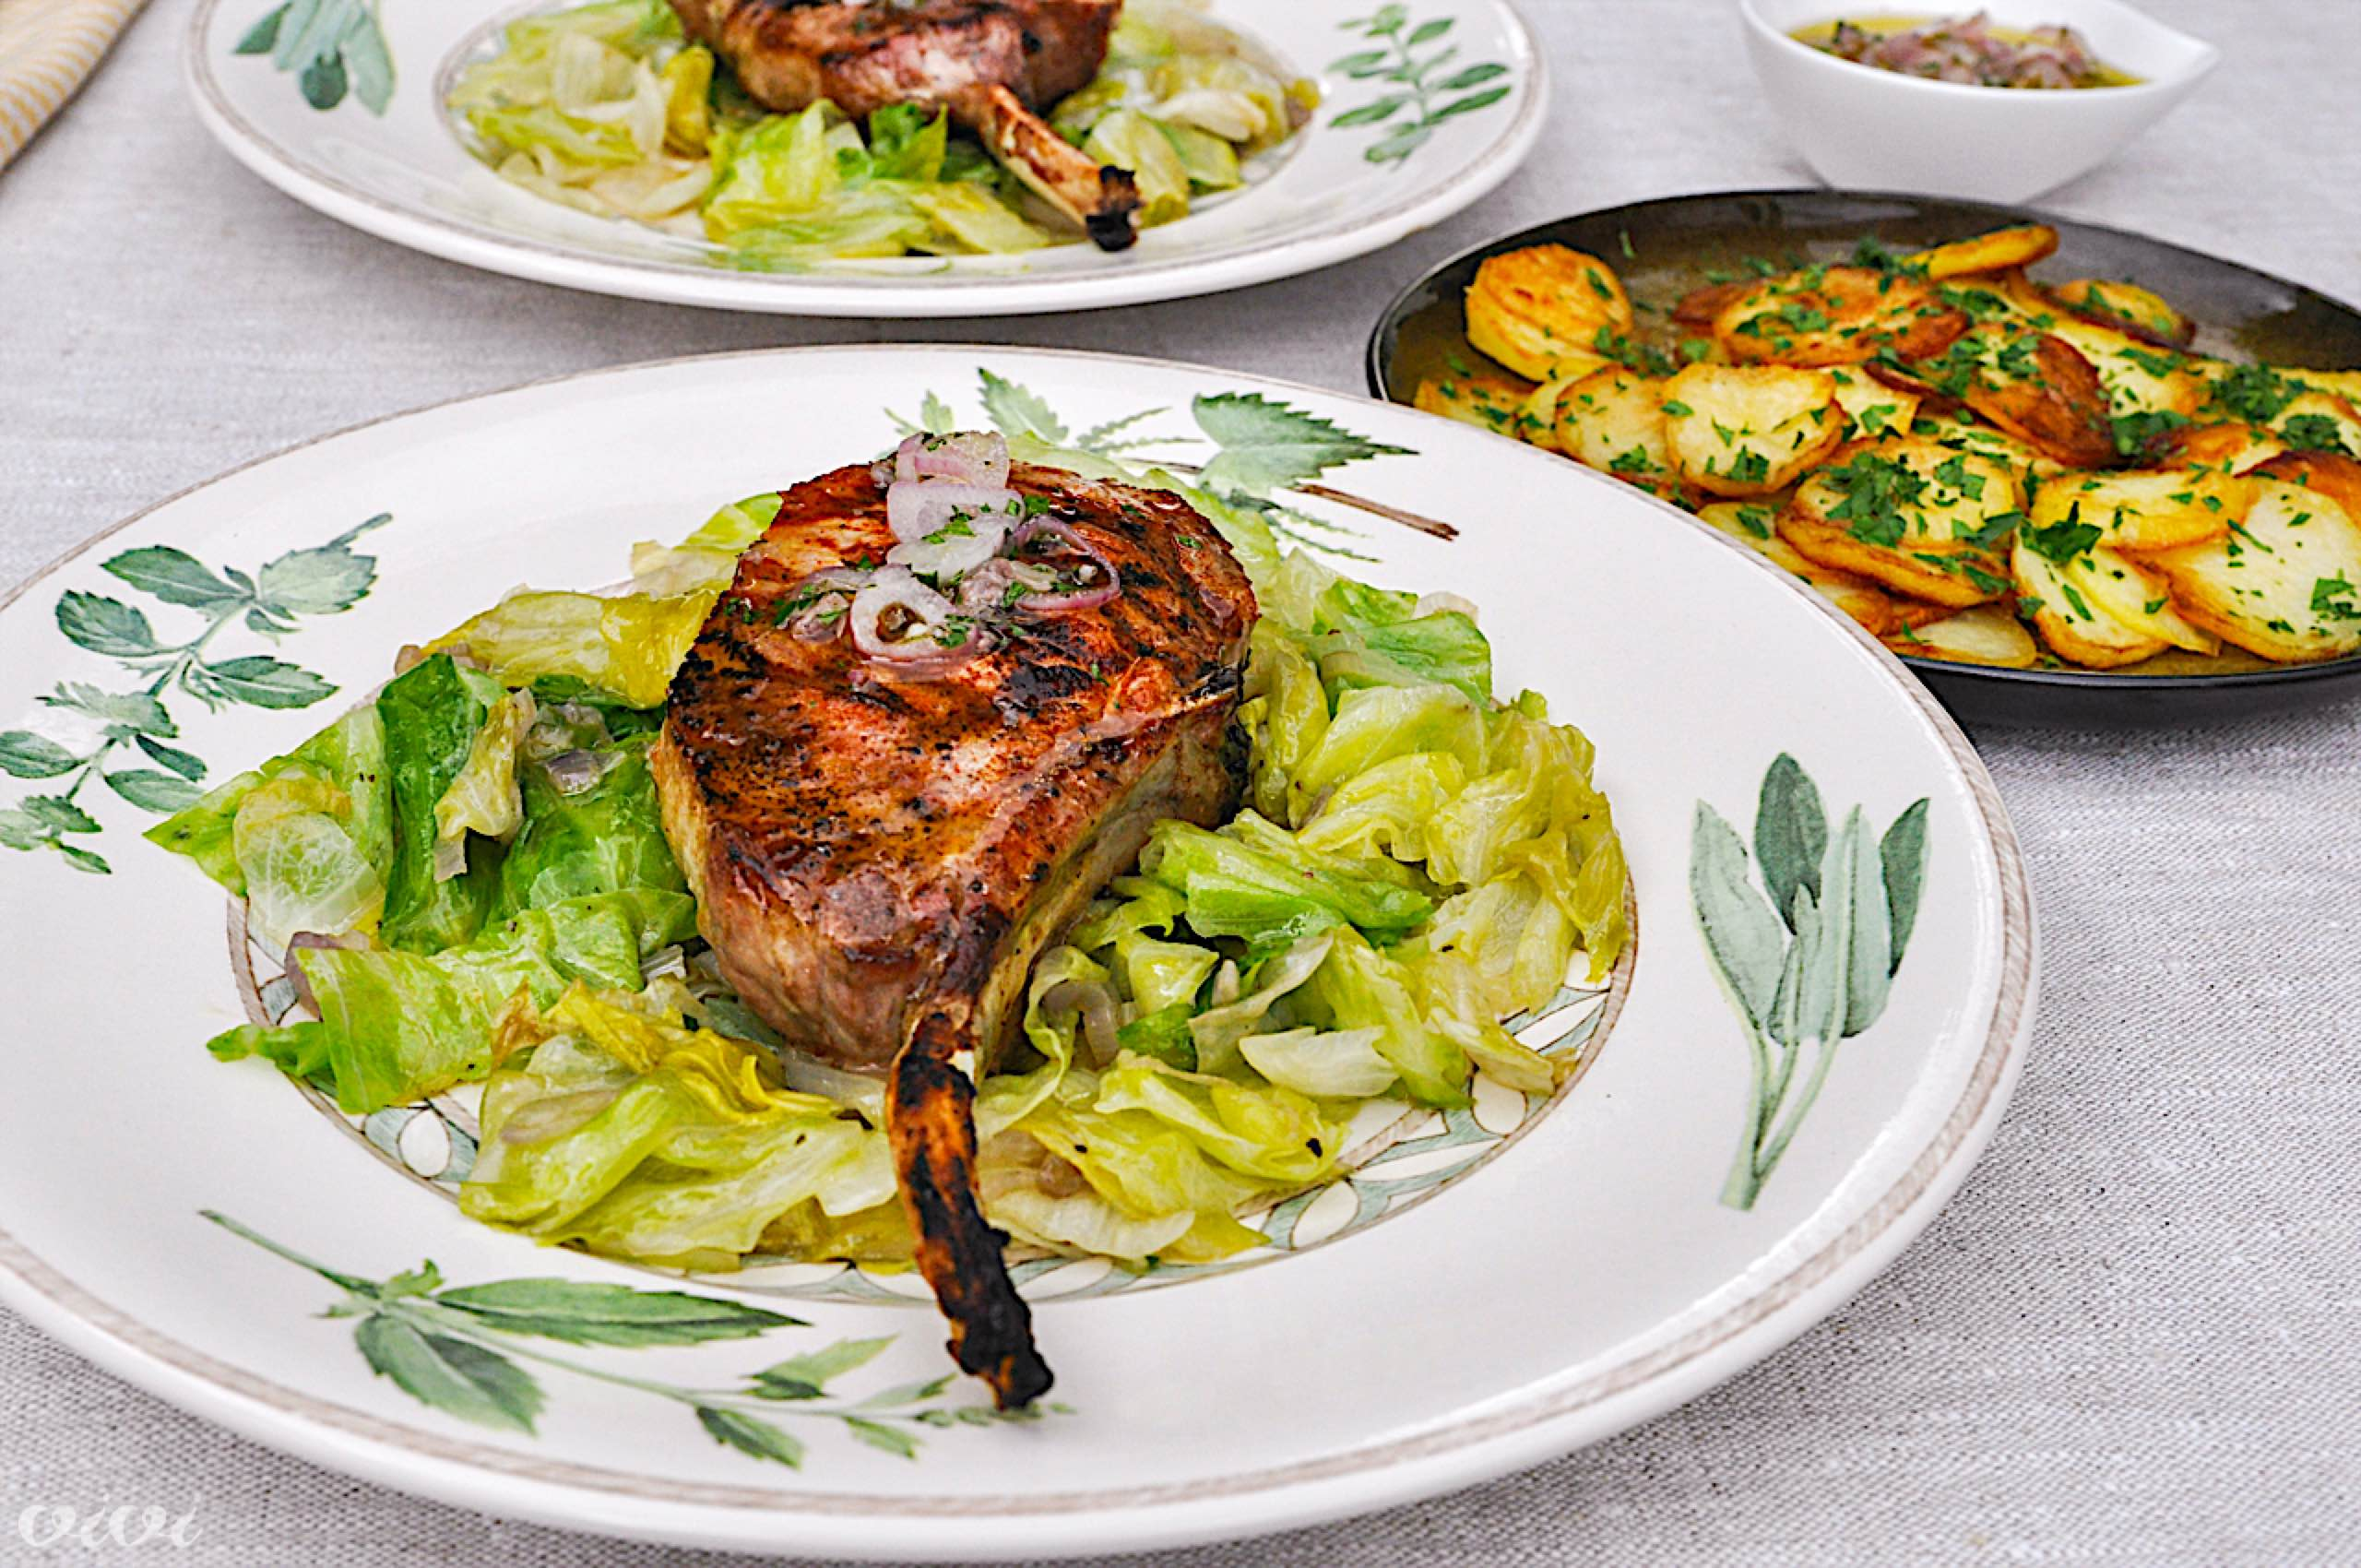 svinjski kotlet na žaru pečena solata šalotkin vinaigrette3